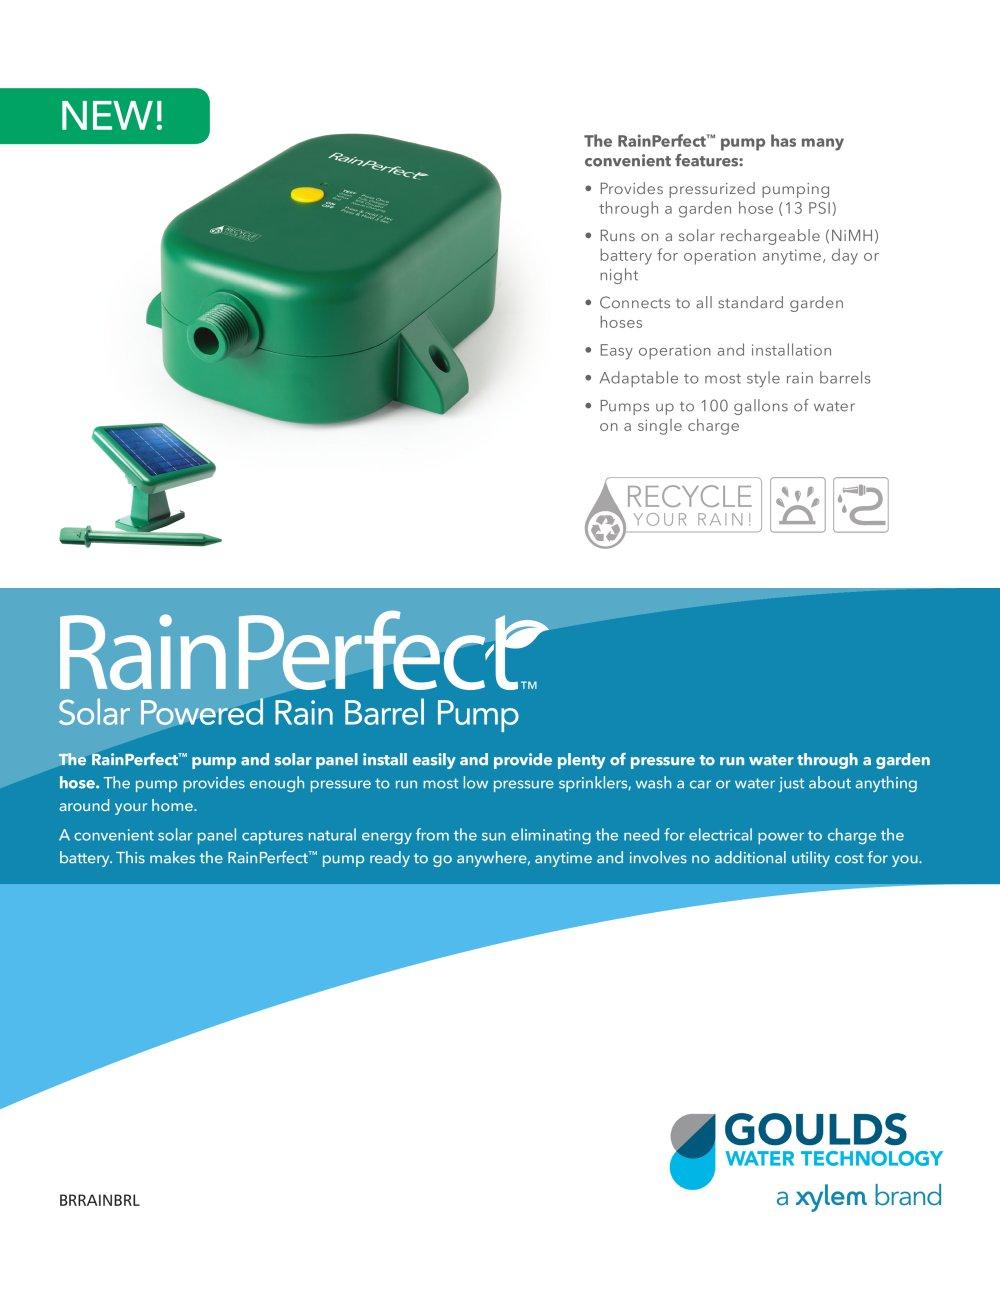 Brrainbrl Rainperfect Solar Ed Rain Barrel Pump 1 2 Pages